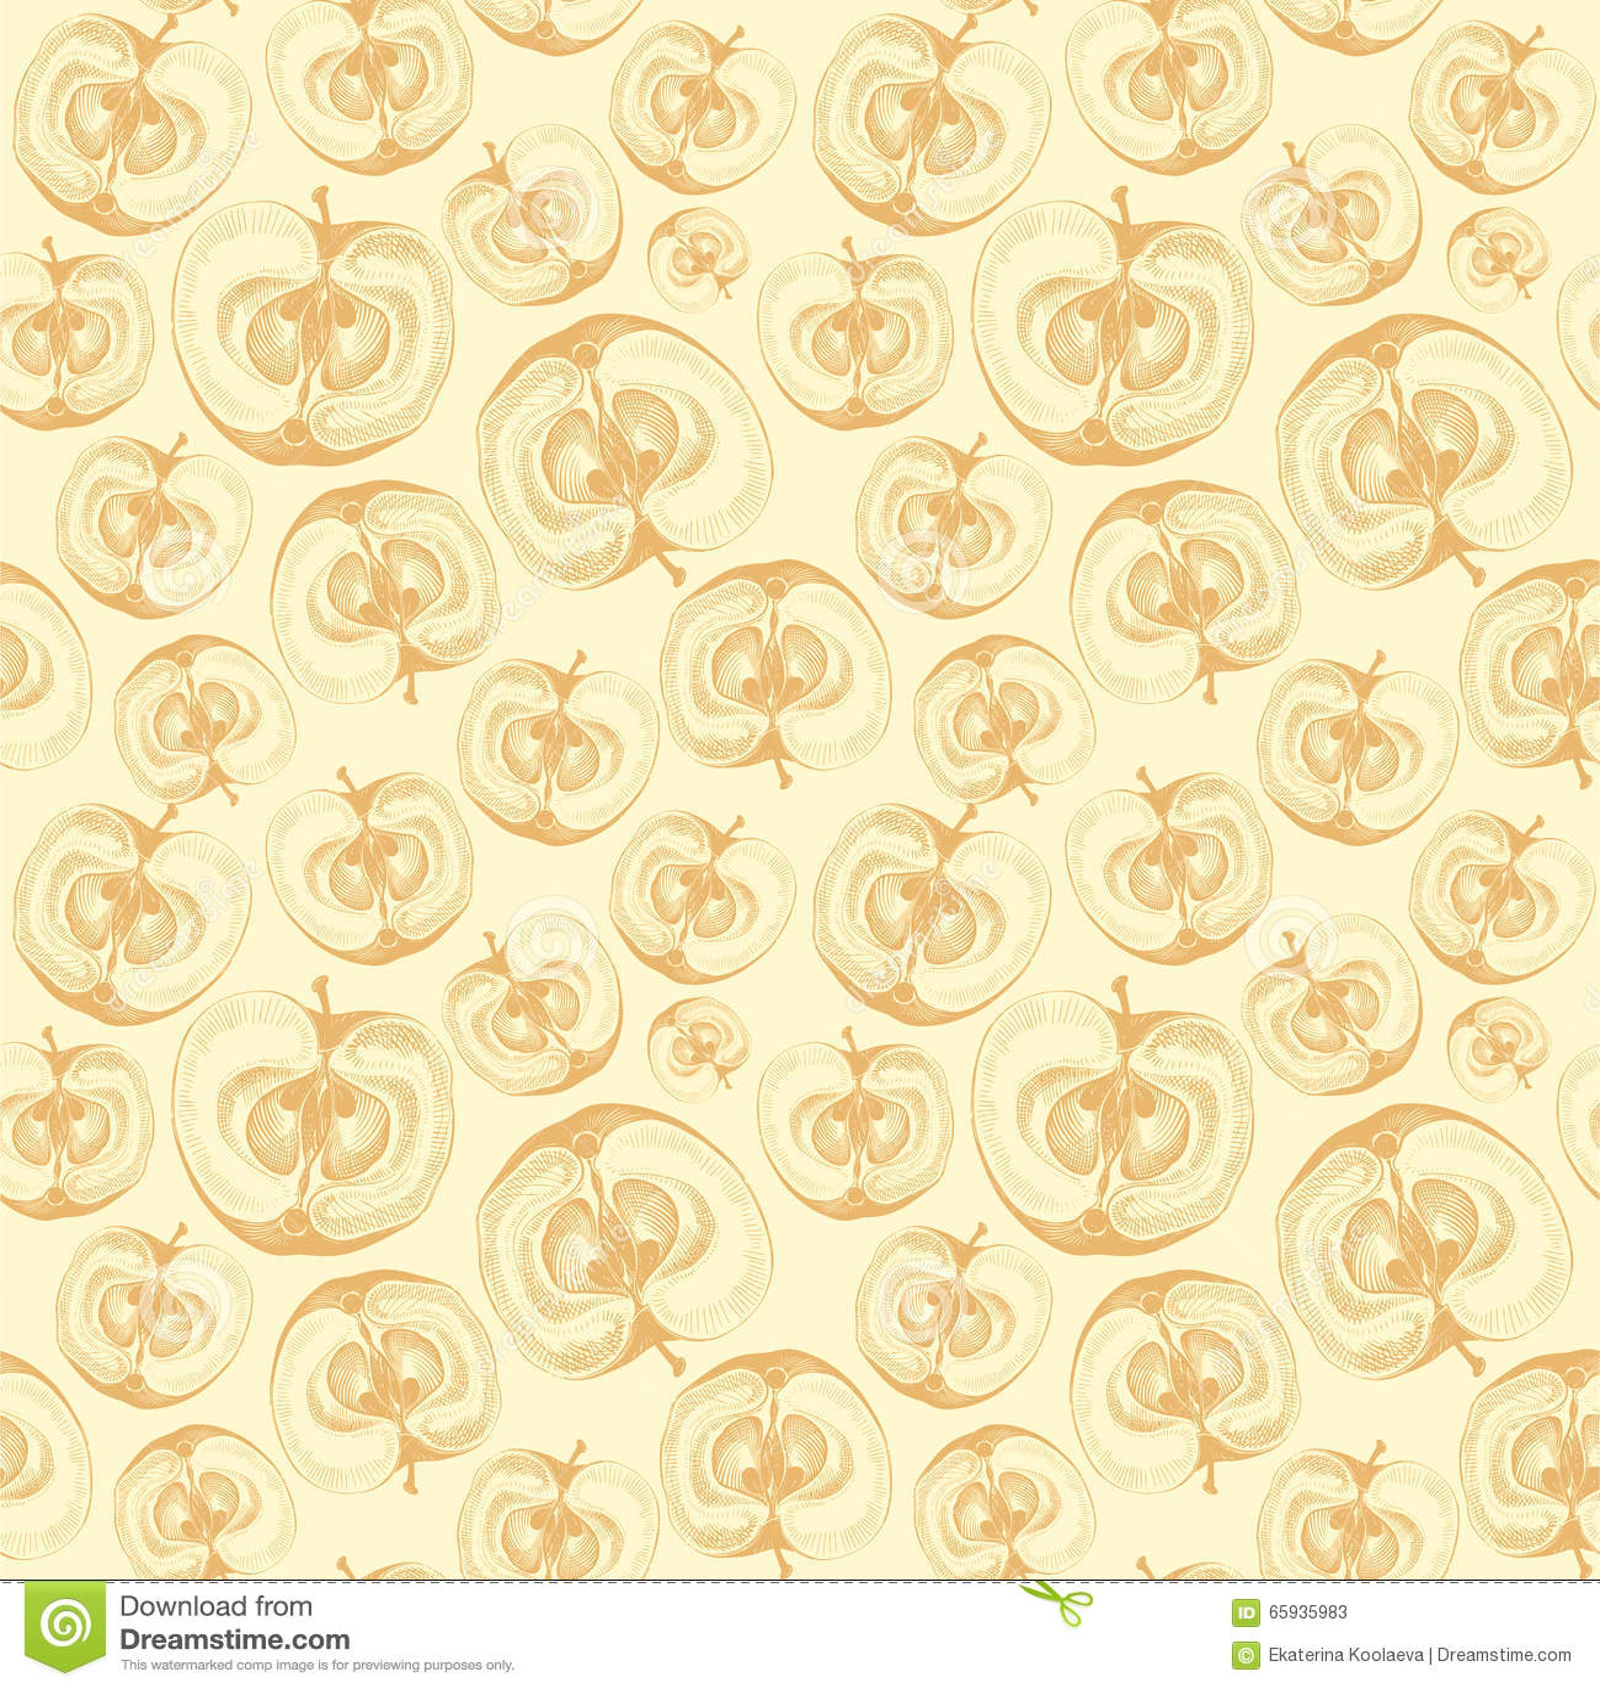 Apple Fruit Wallpaper Seamless Pattern. Stock Illustration ...